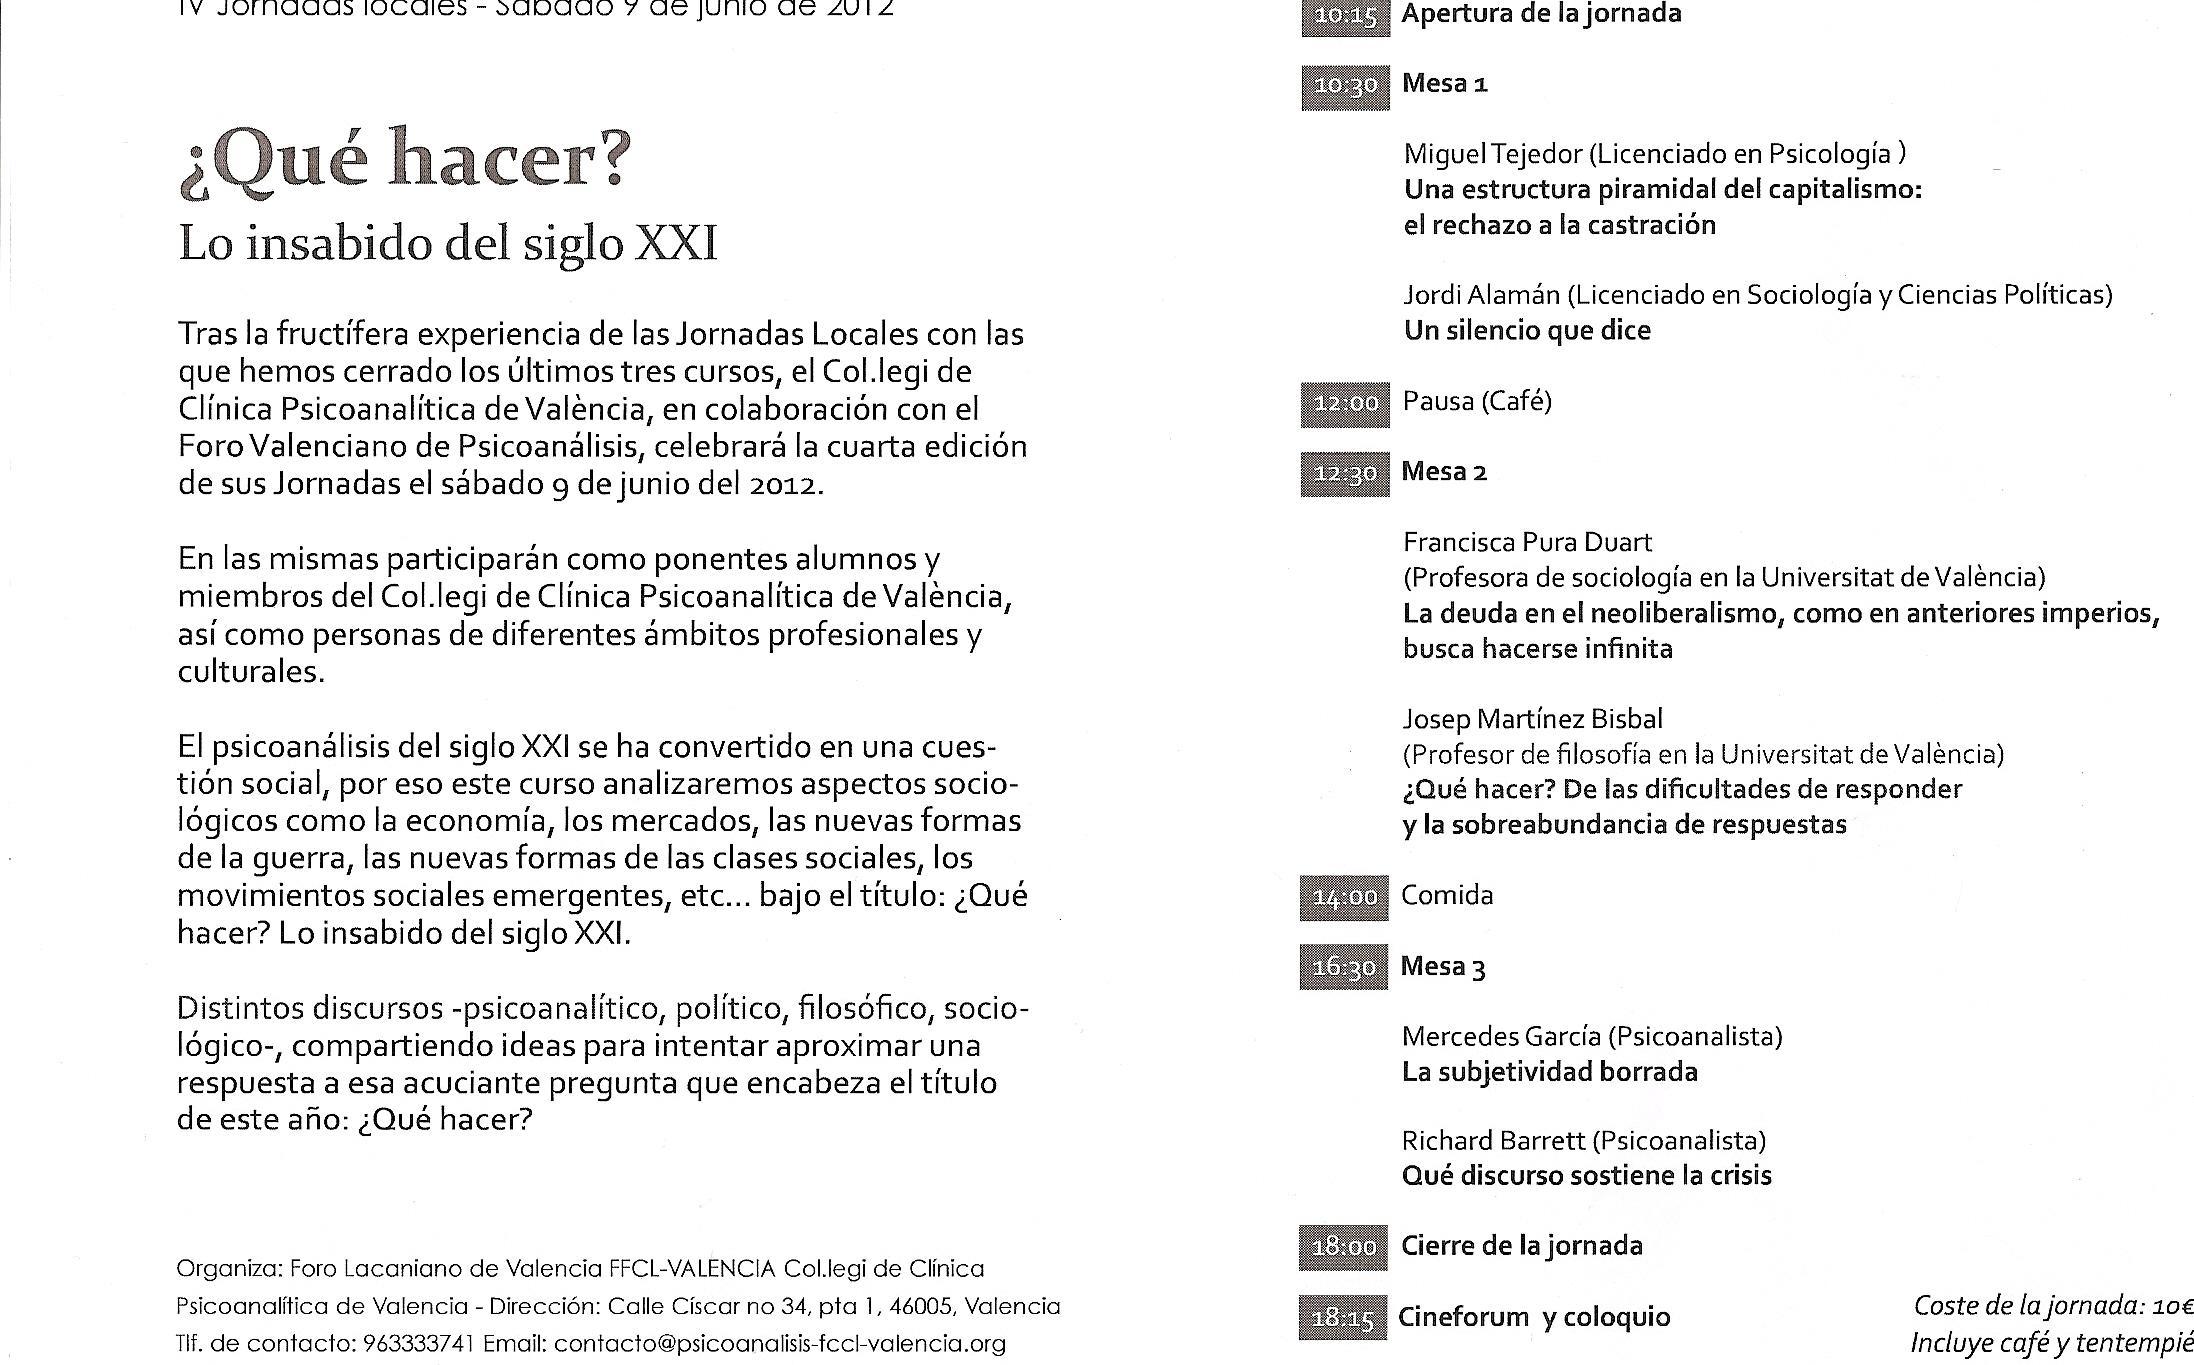 UNA ESTRUCTURA DEL CAPITALISMO PIRAMIDAL (Valencia, 2012)